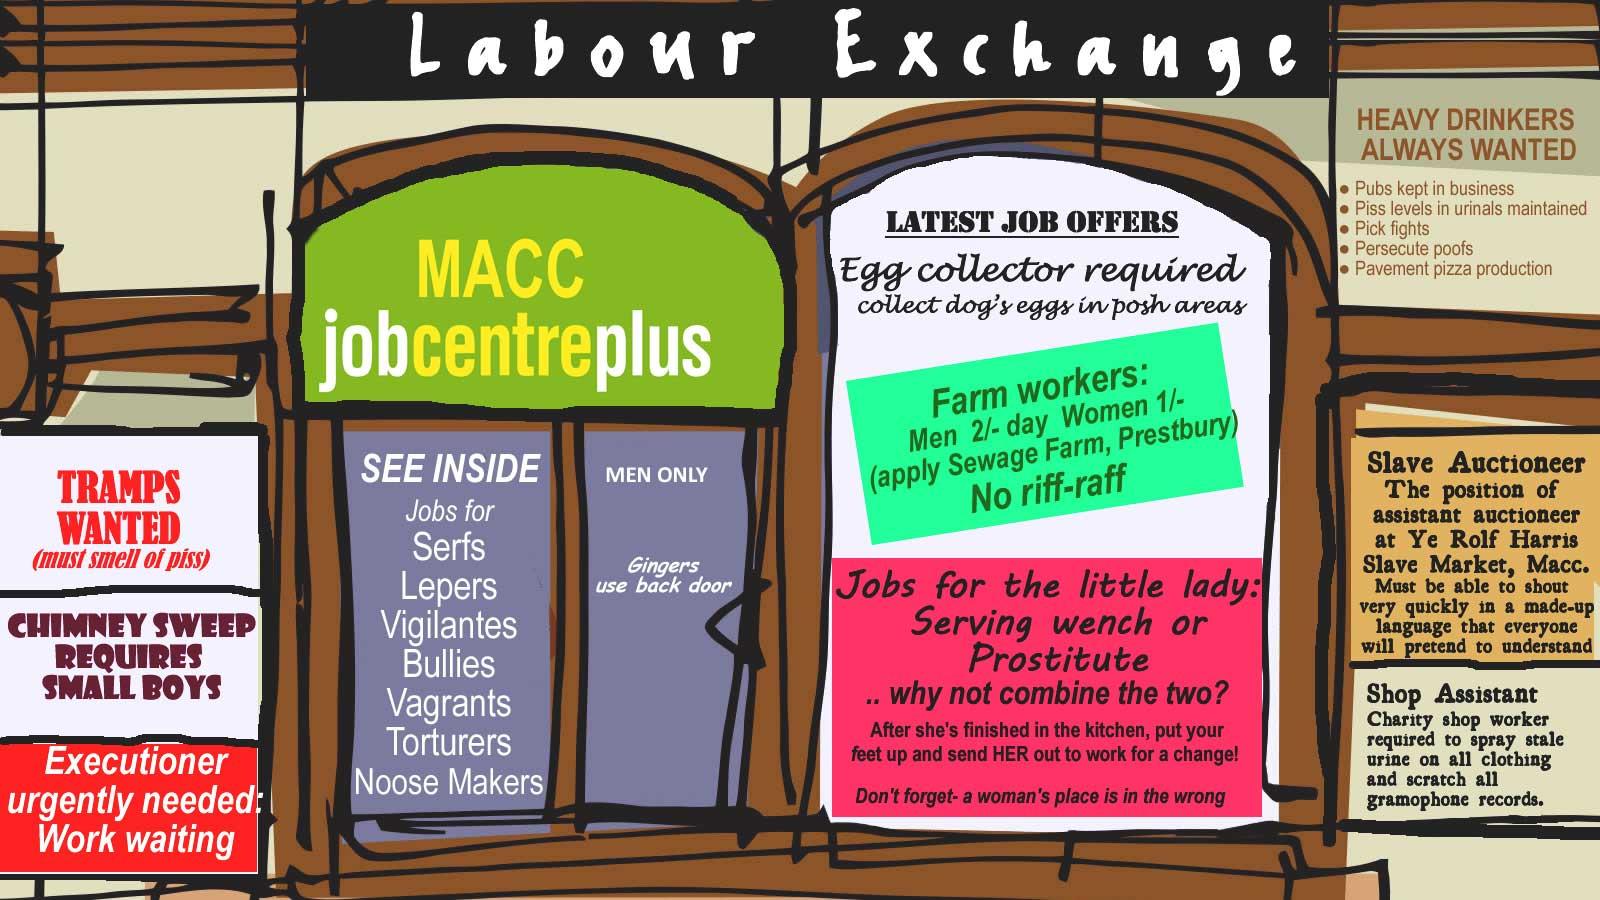 Macc World Job Centre